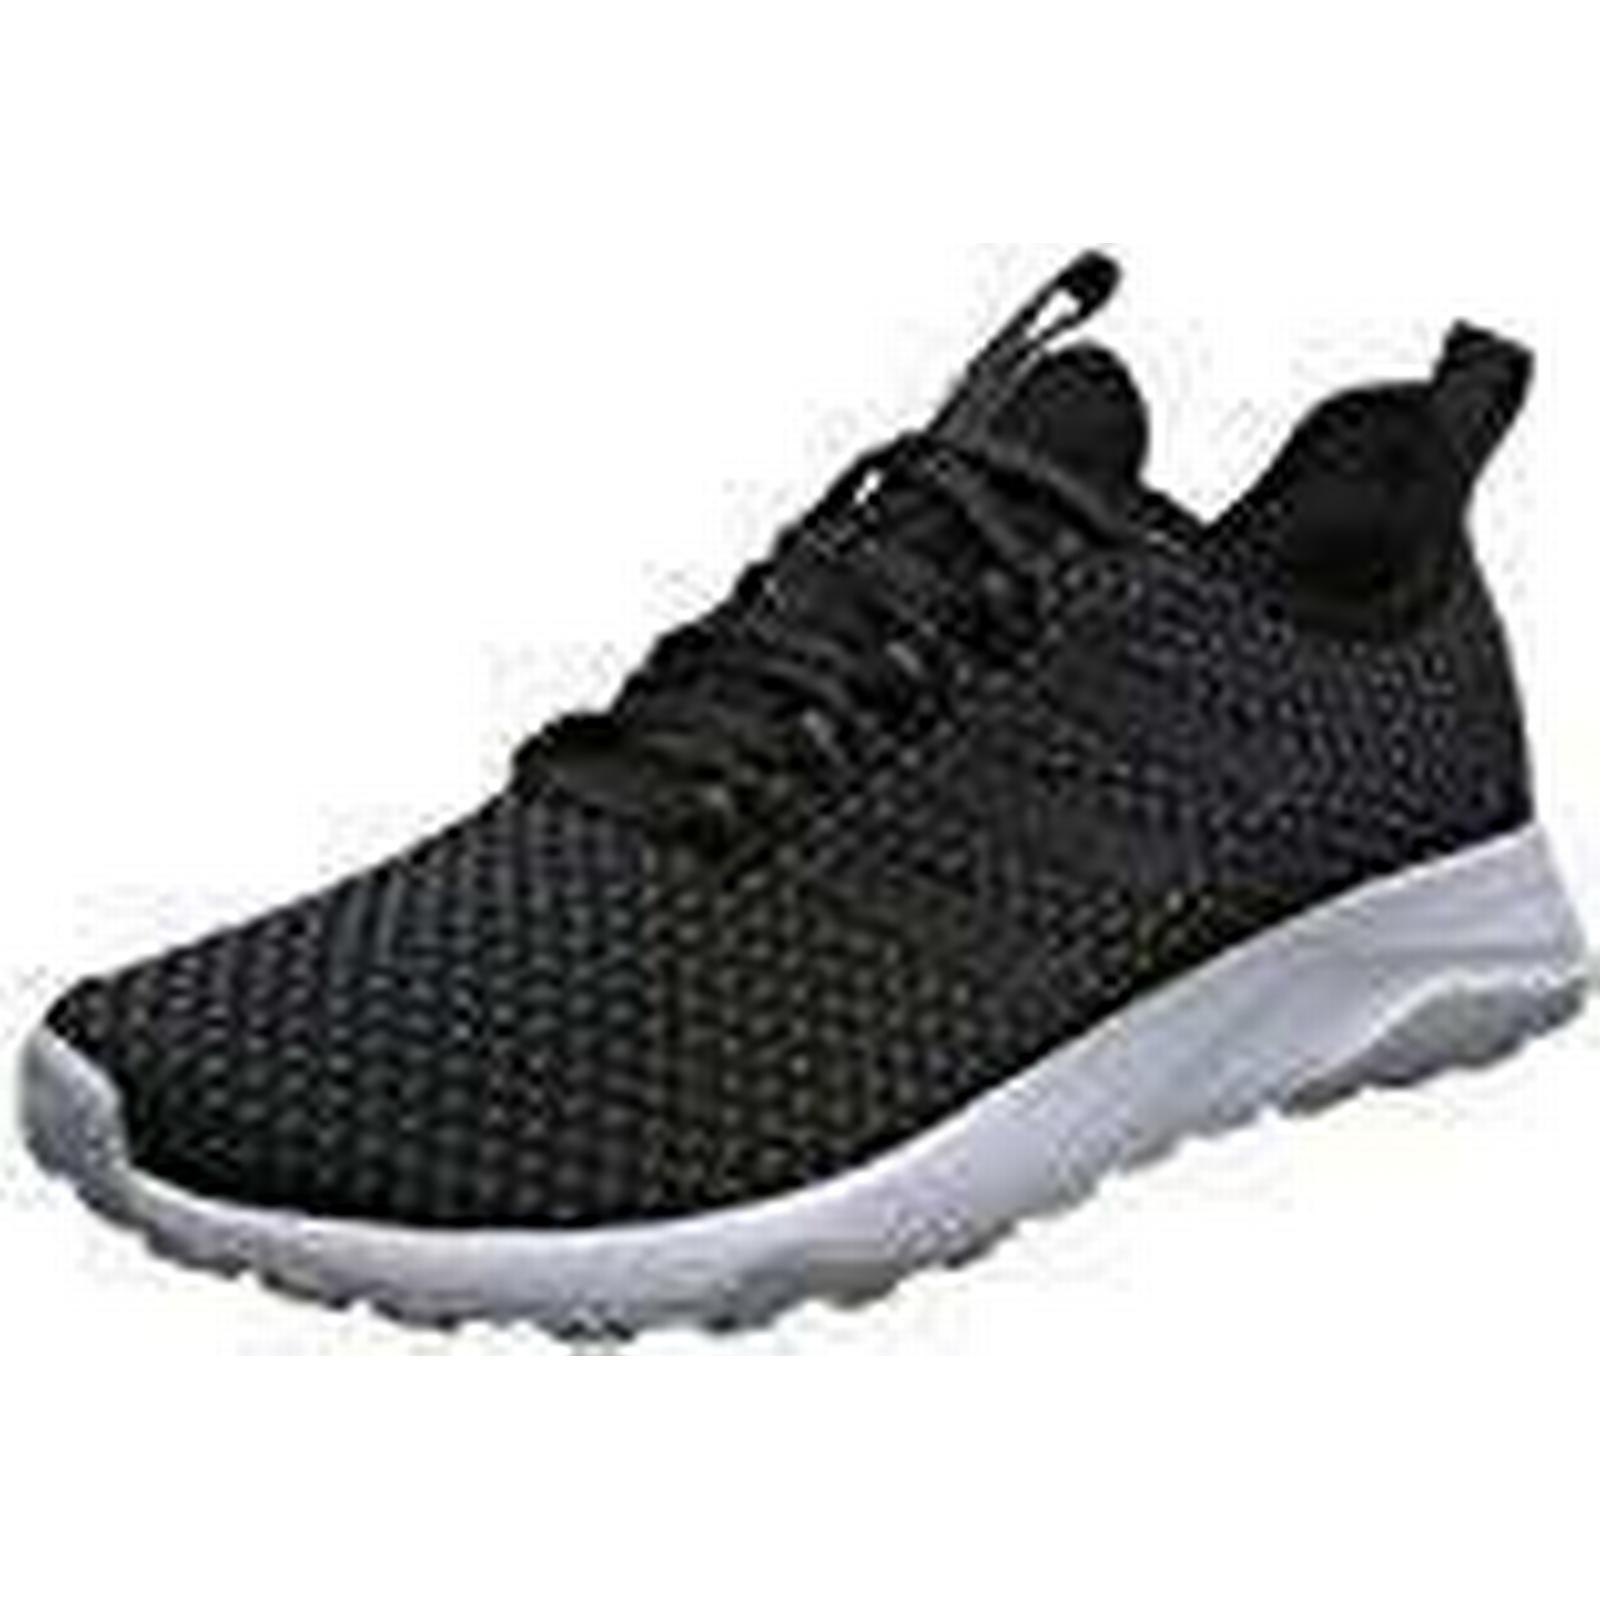 Adidas Men's Core Cloudfoam Superflex TR Trainers, Core Men's Black/Grey Two, 10 UK 44 2/3 EU 0f2cb7